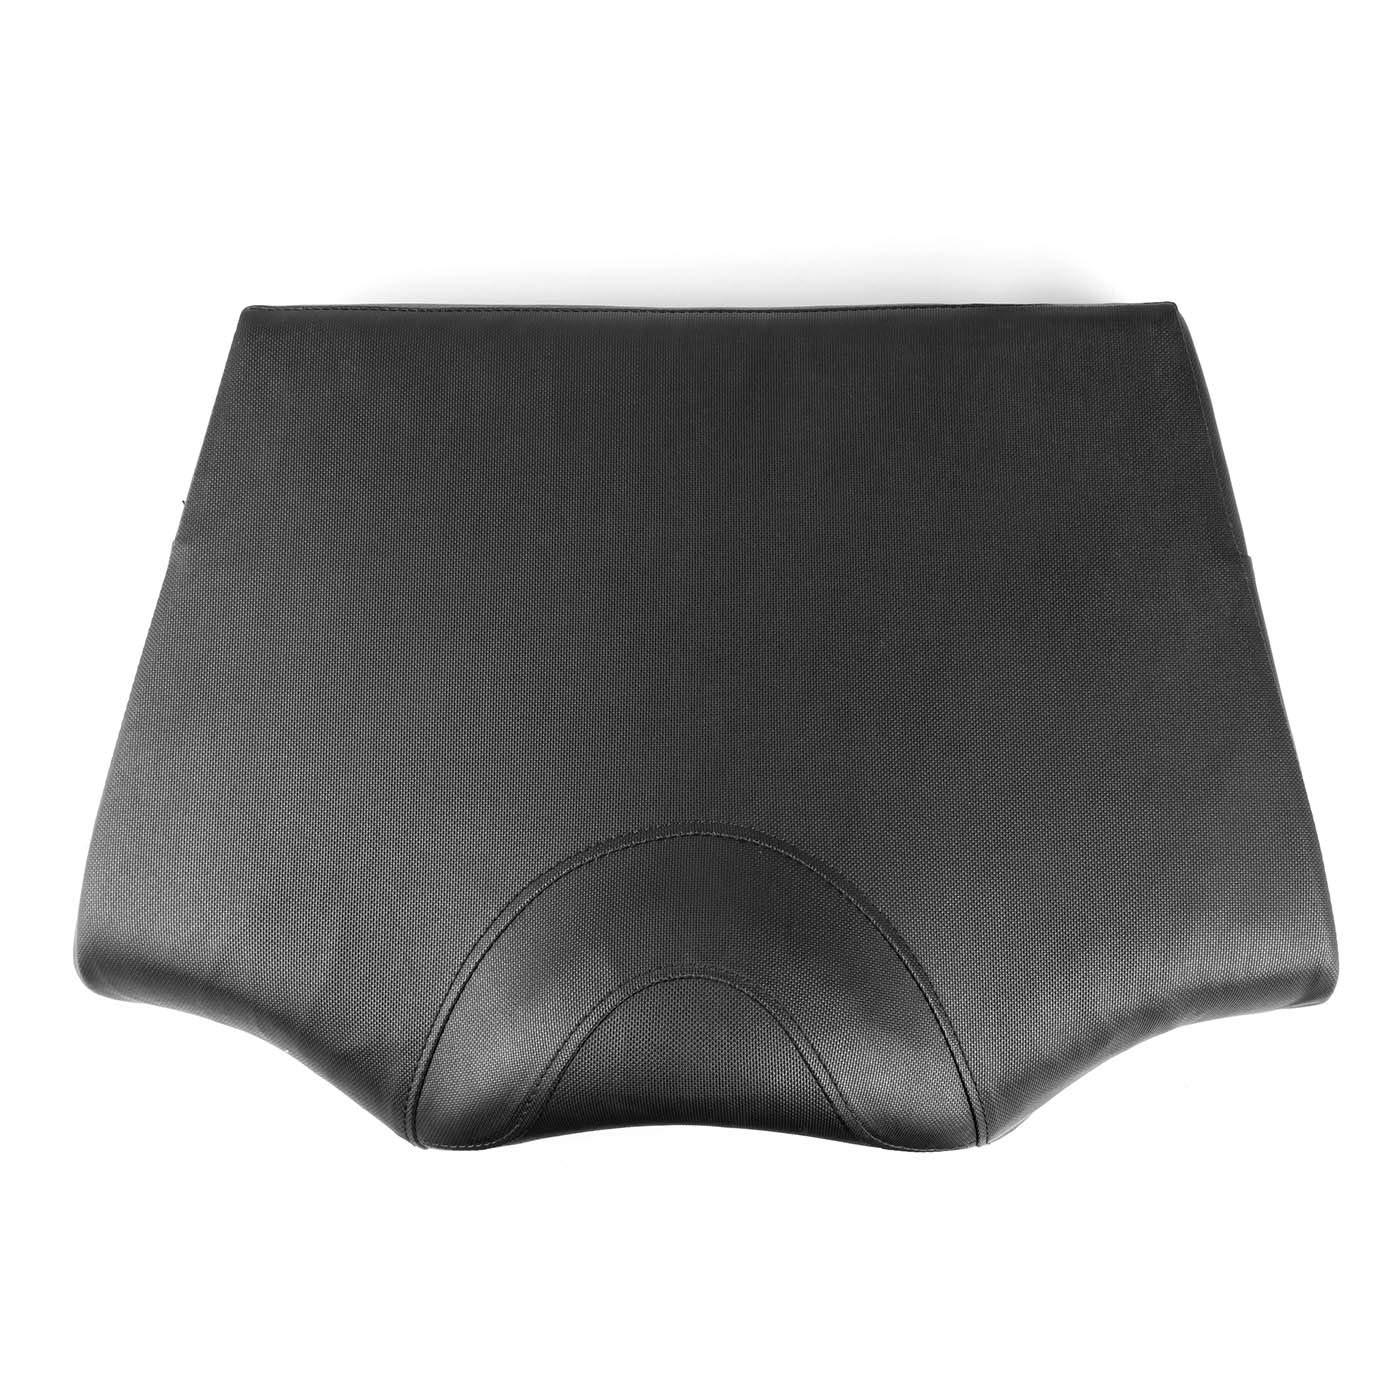 Kimpex Backrest Cushion For Nomad Trunk ATV